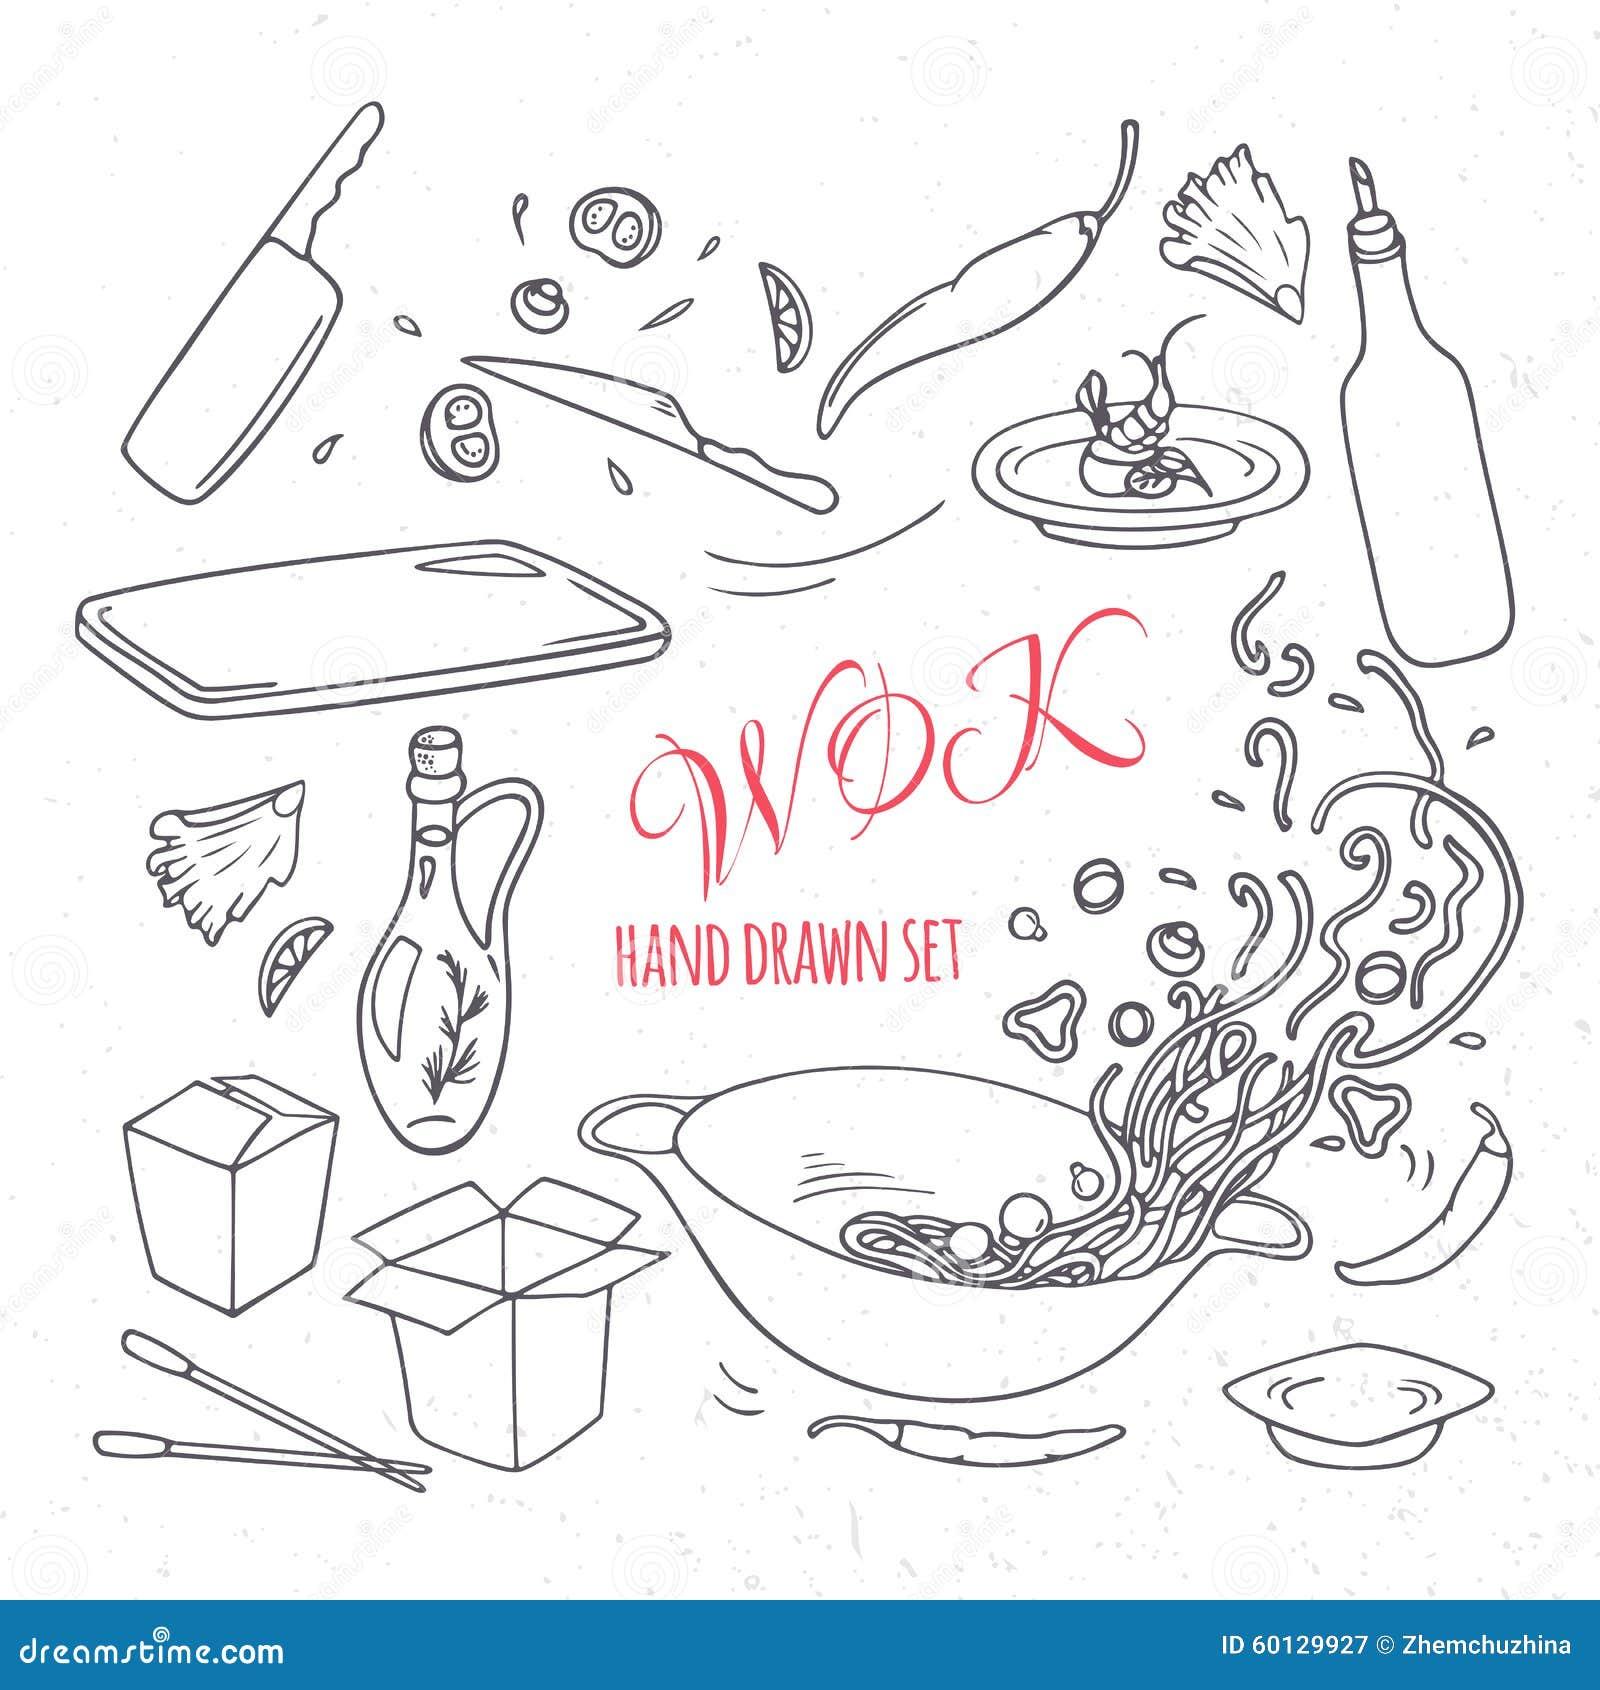 Set Of Outline Hand Drawn Wok Restaurant Elements For Your Design Doodle Asian Food Vector Il Ration